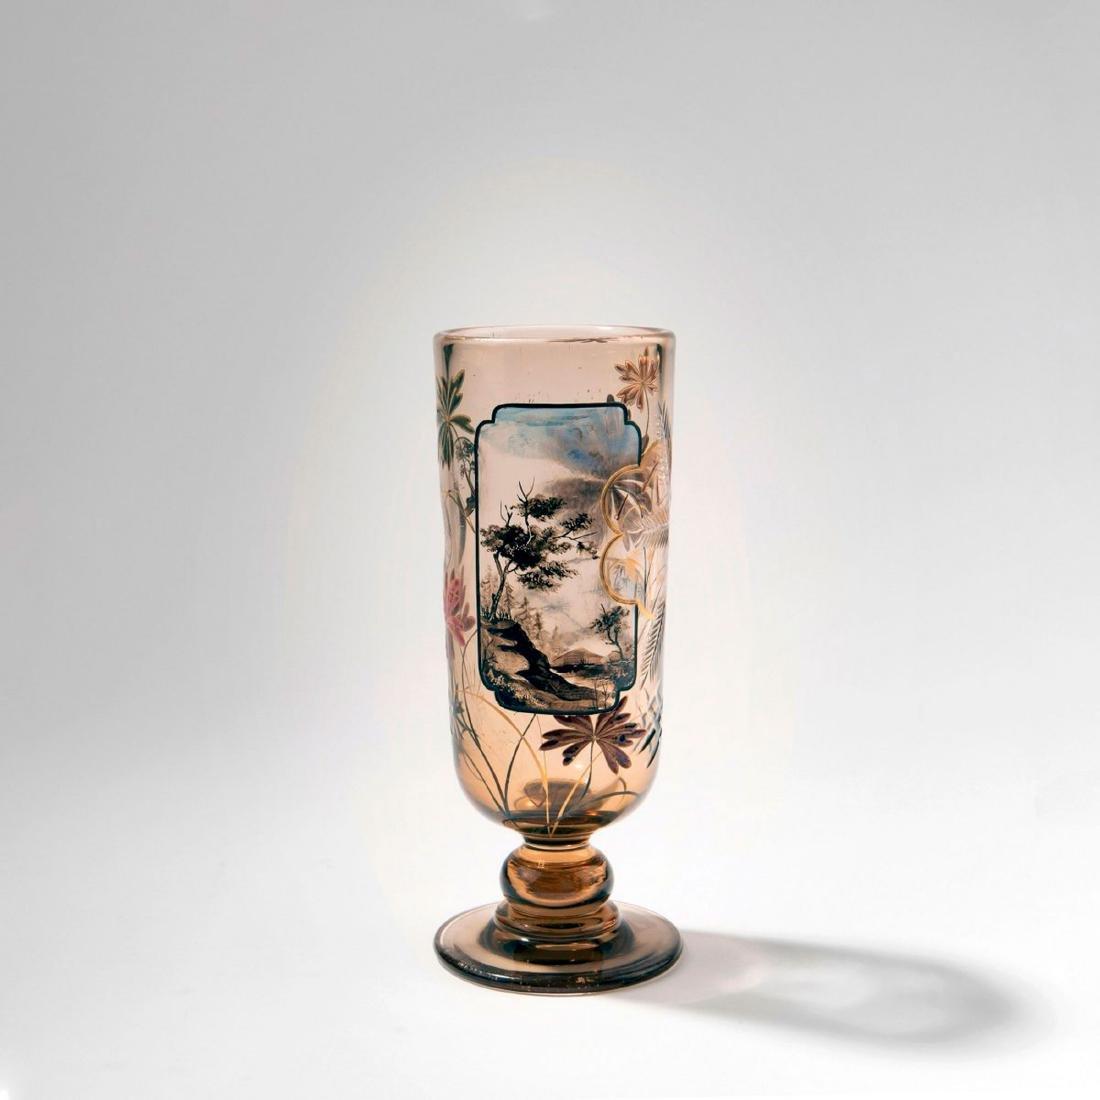 Historicising vase, c. 1887